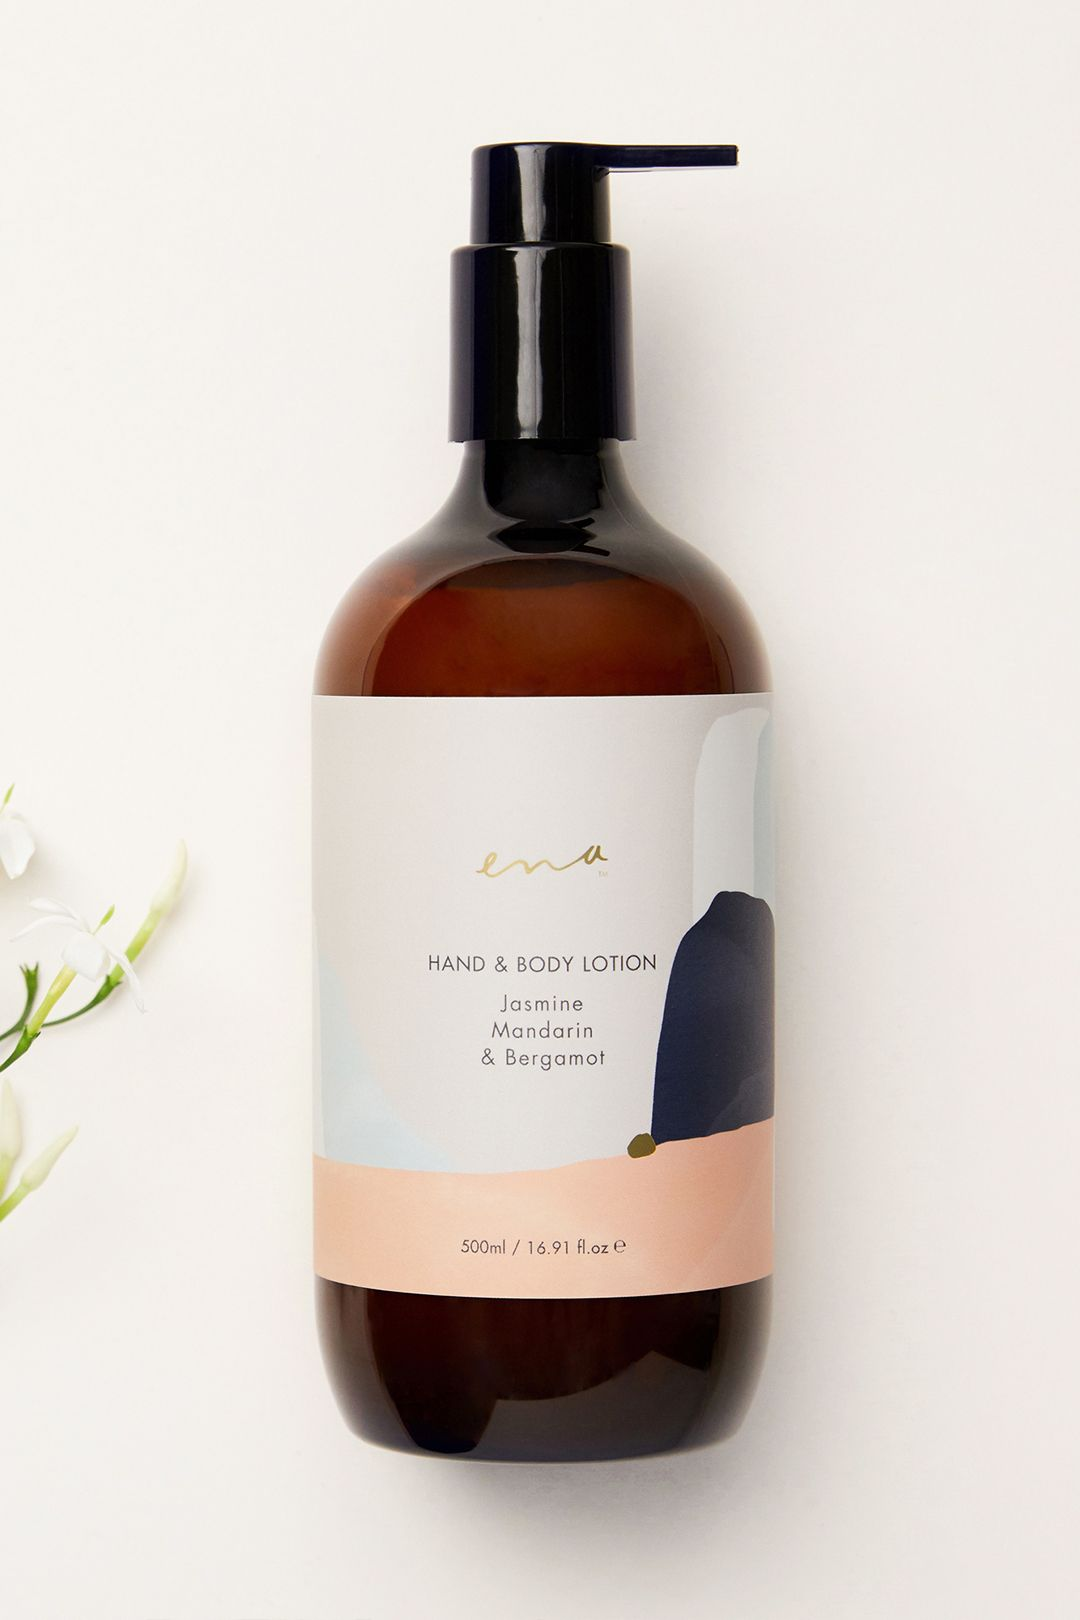 Ena-Hand-and-Body-Lotion-Jasmine-Mandarin-and-Bergamot-Product